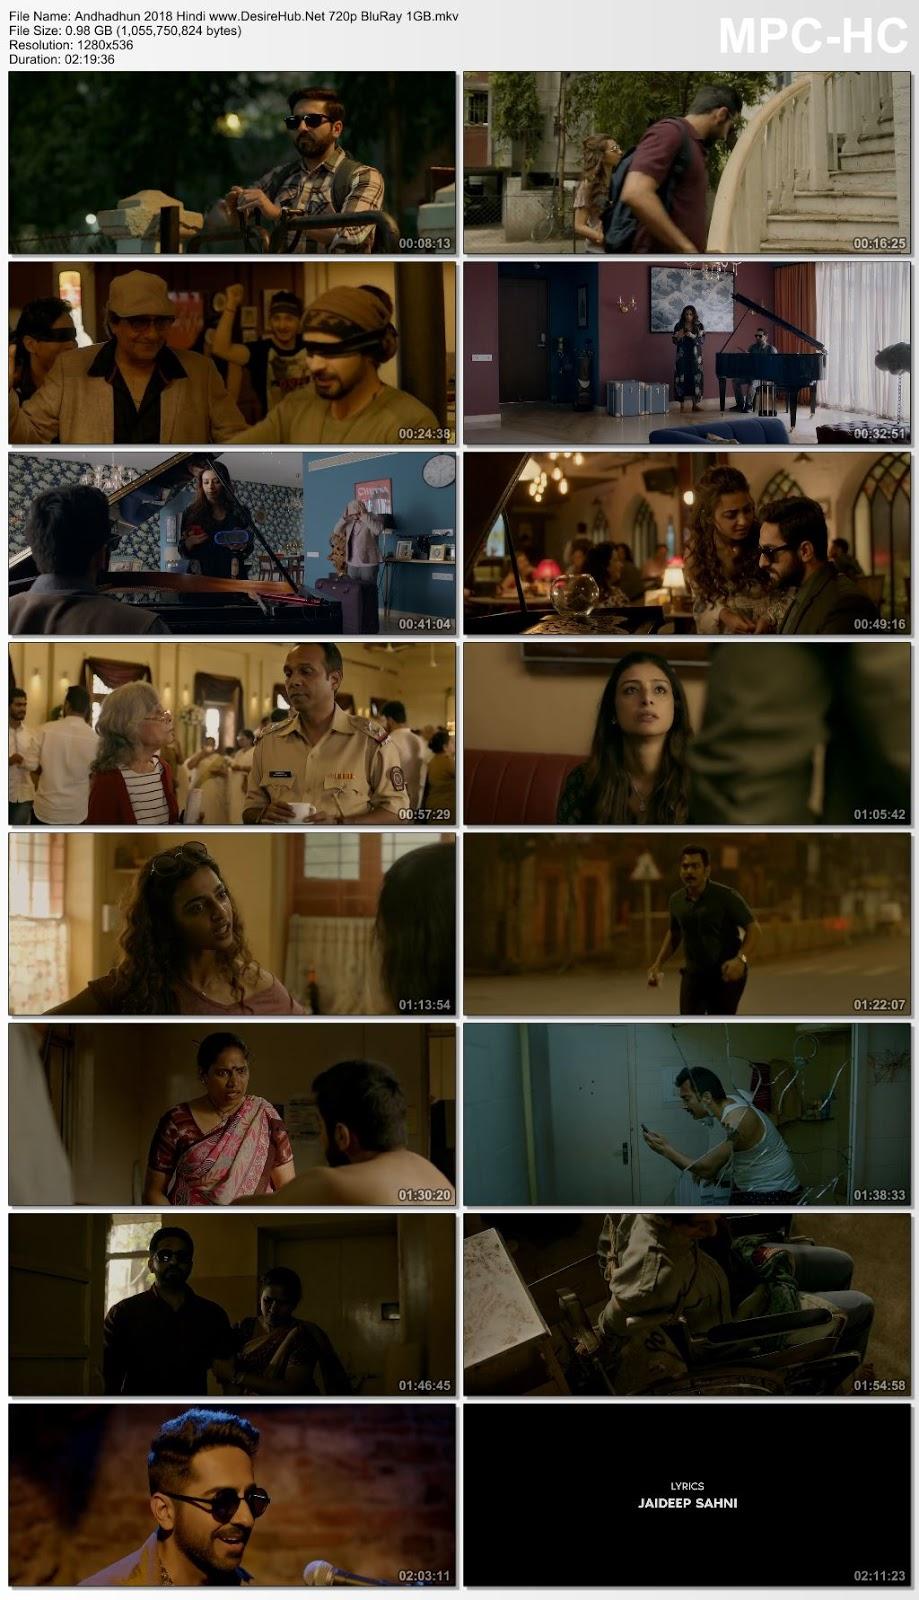 Andhadhun 2018 Hindi 720p BluRay 1GB Desirehub